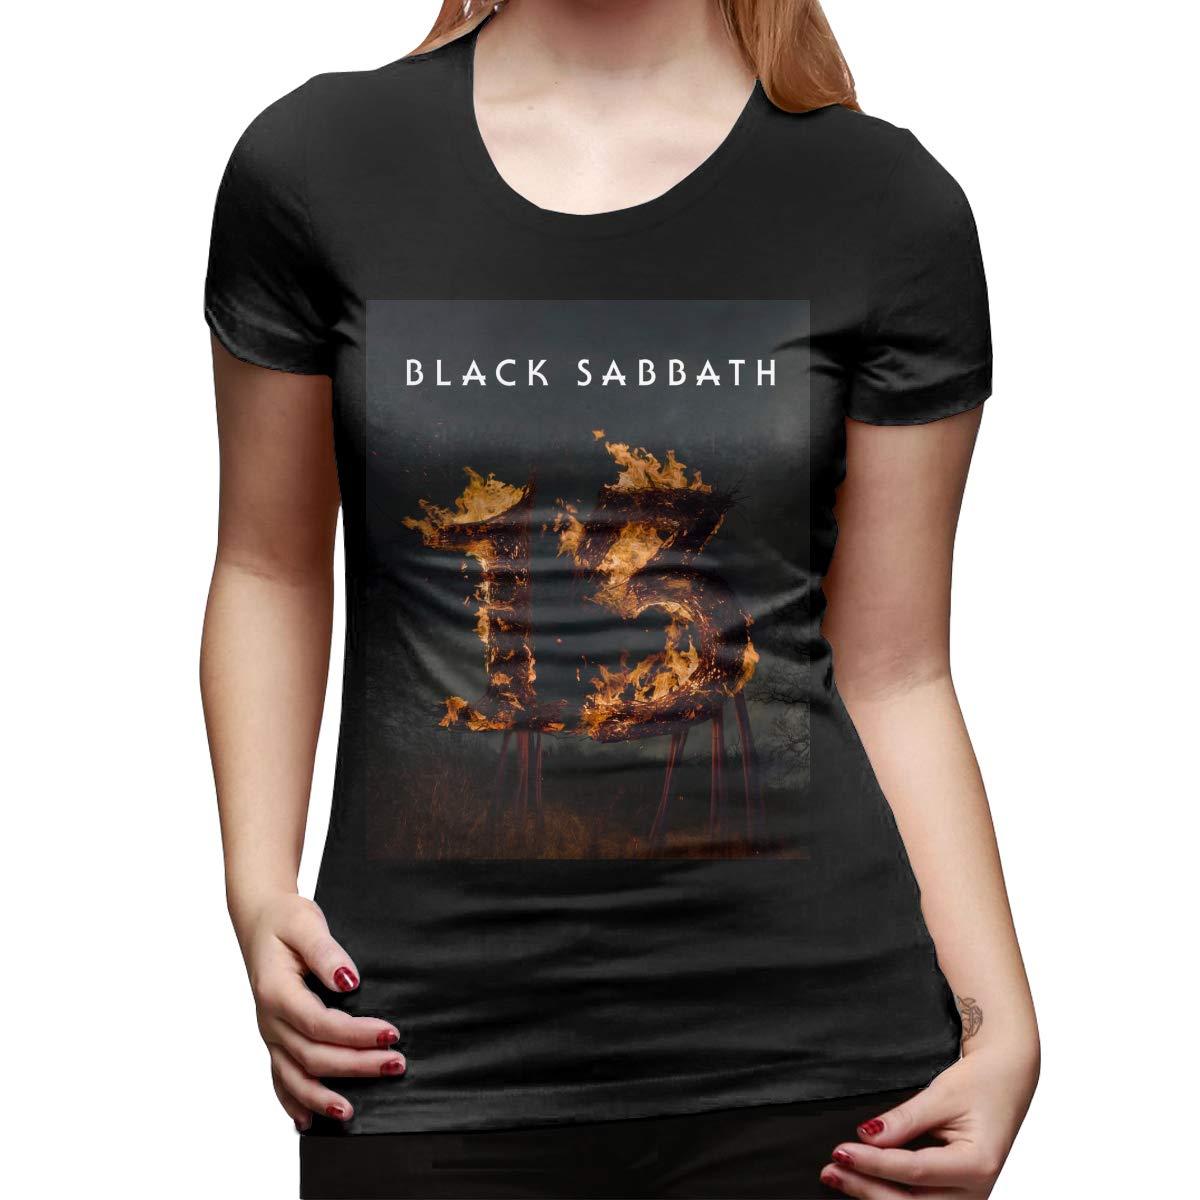 Black Sabbath 13 2013 Fashion Short Sleeve T Shirt